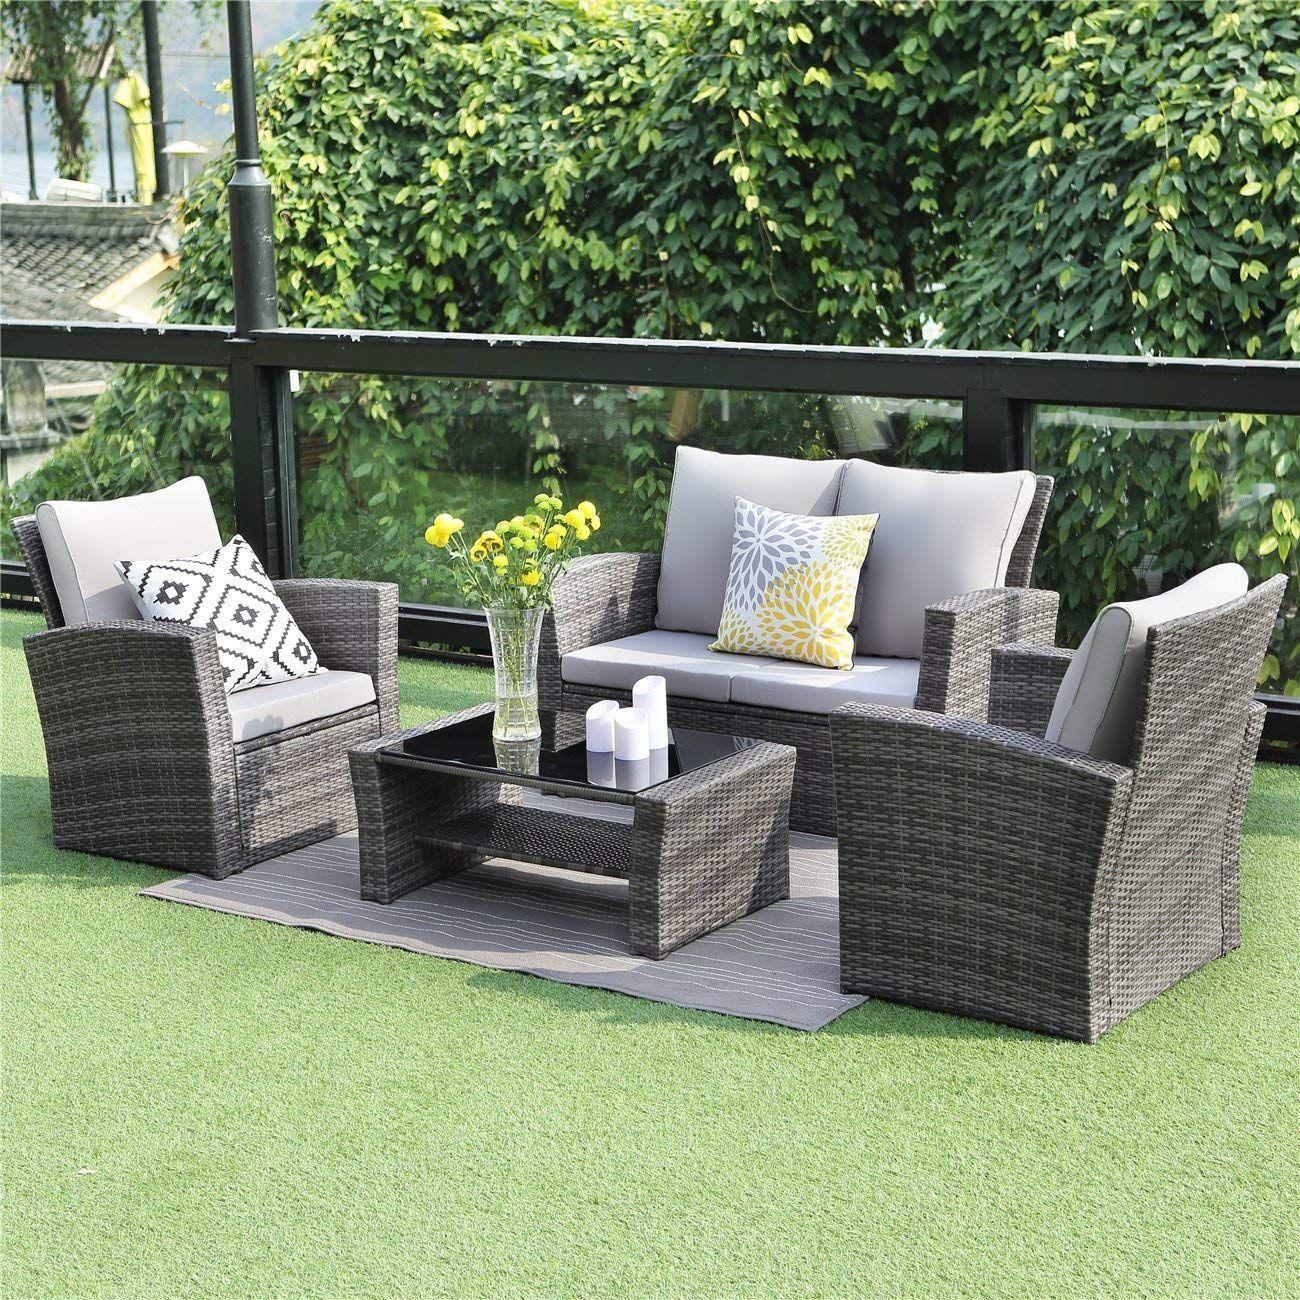 Awe Inspiring Amazon Com Wisteria Lane 5 Piece Outdoor Patio Furniture Home Interior And Landscaping Ologienasavecom